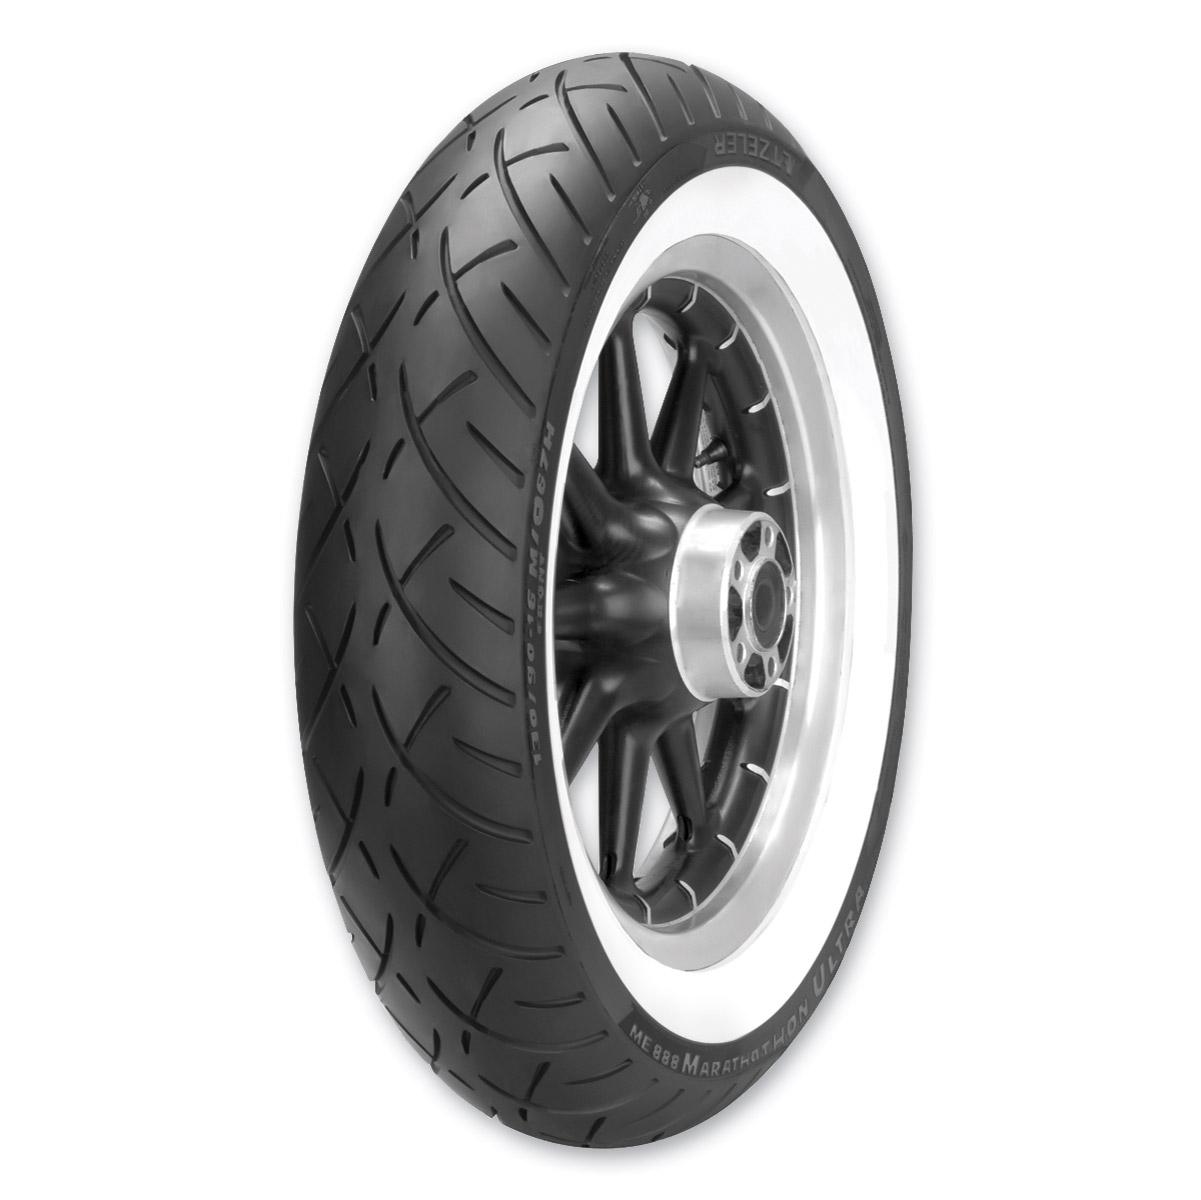 Metzeler ME888 Marathon Ultra 130/80B17 Wide Whitewall Front Tire